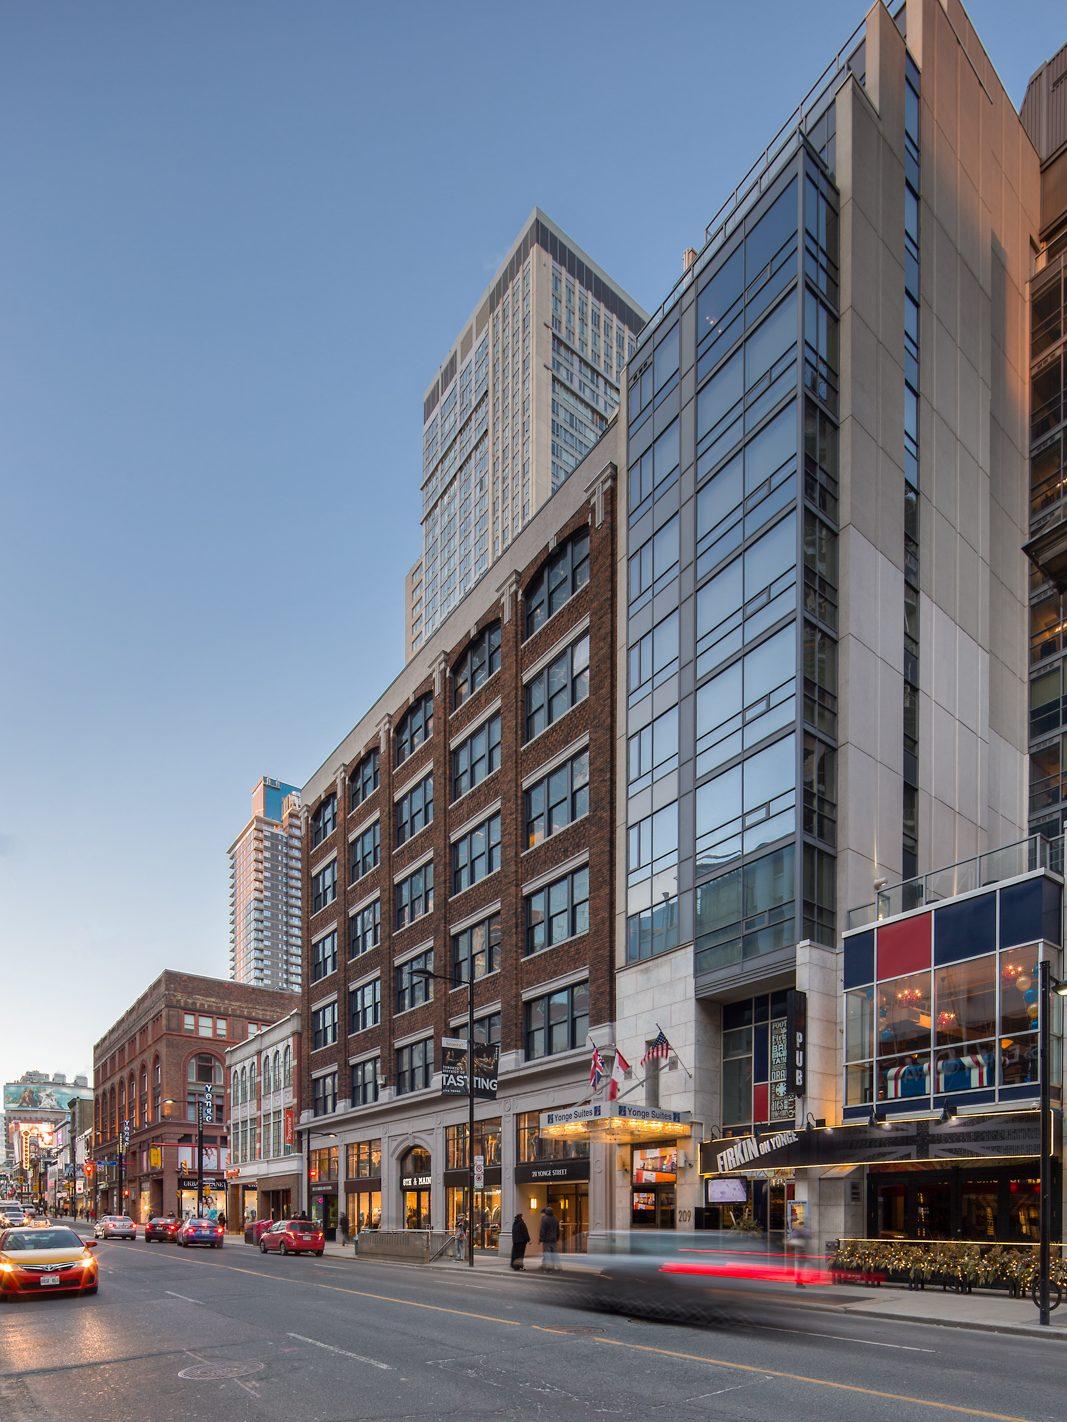 Street view of midrise brick building